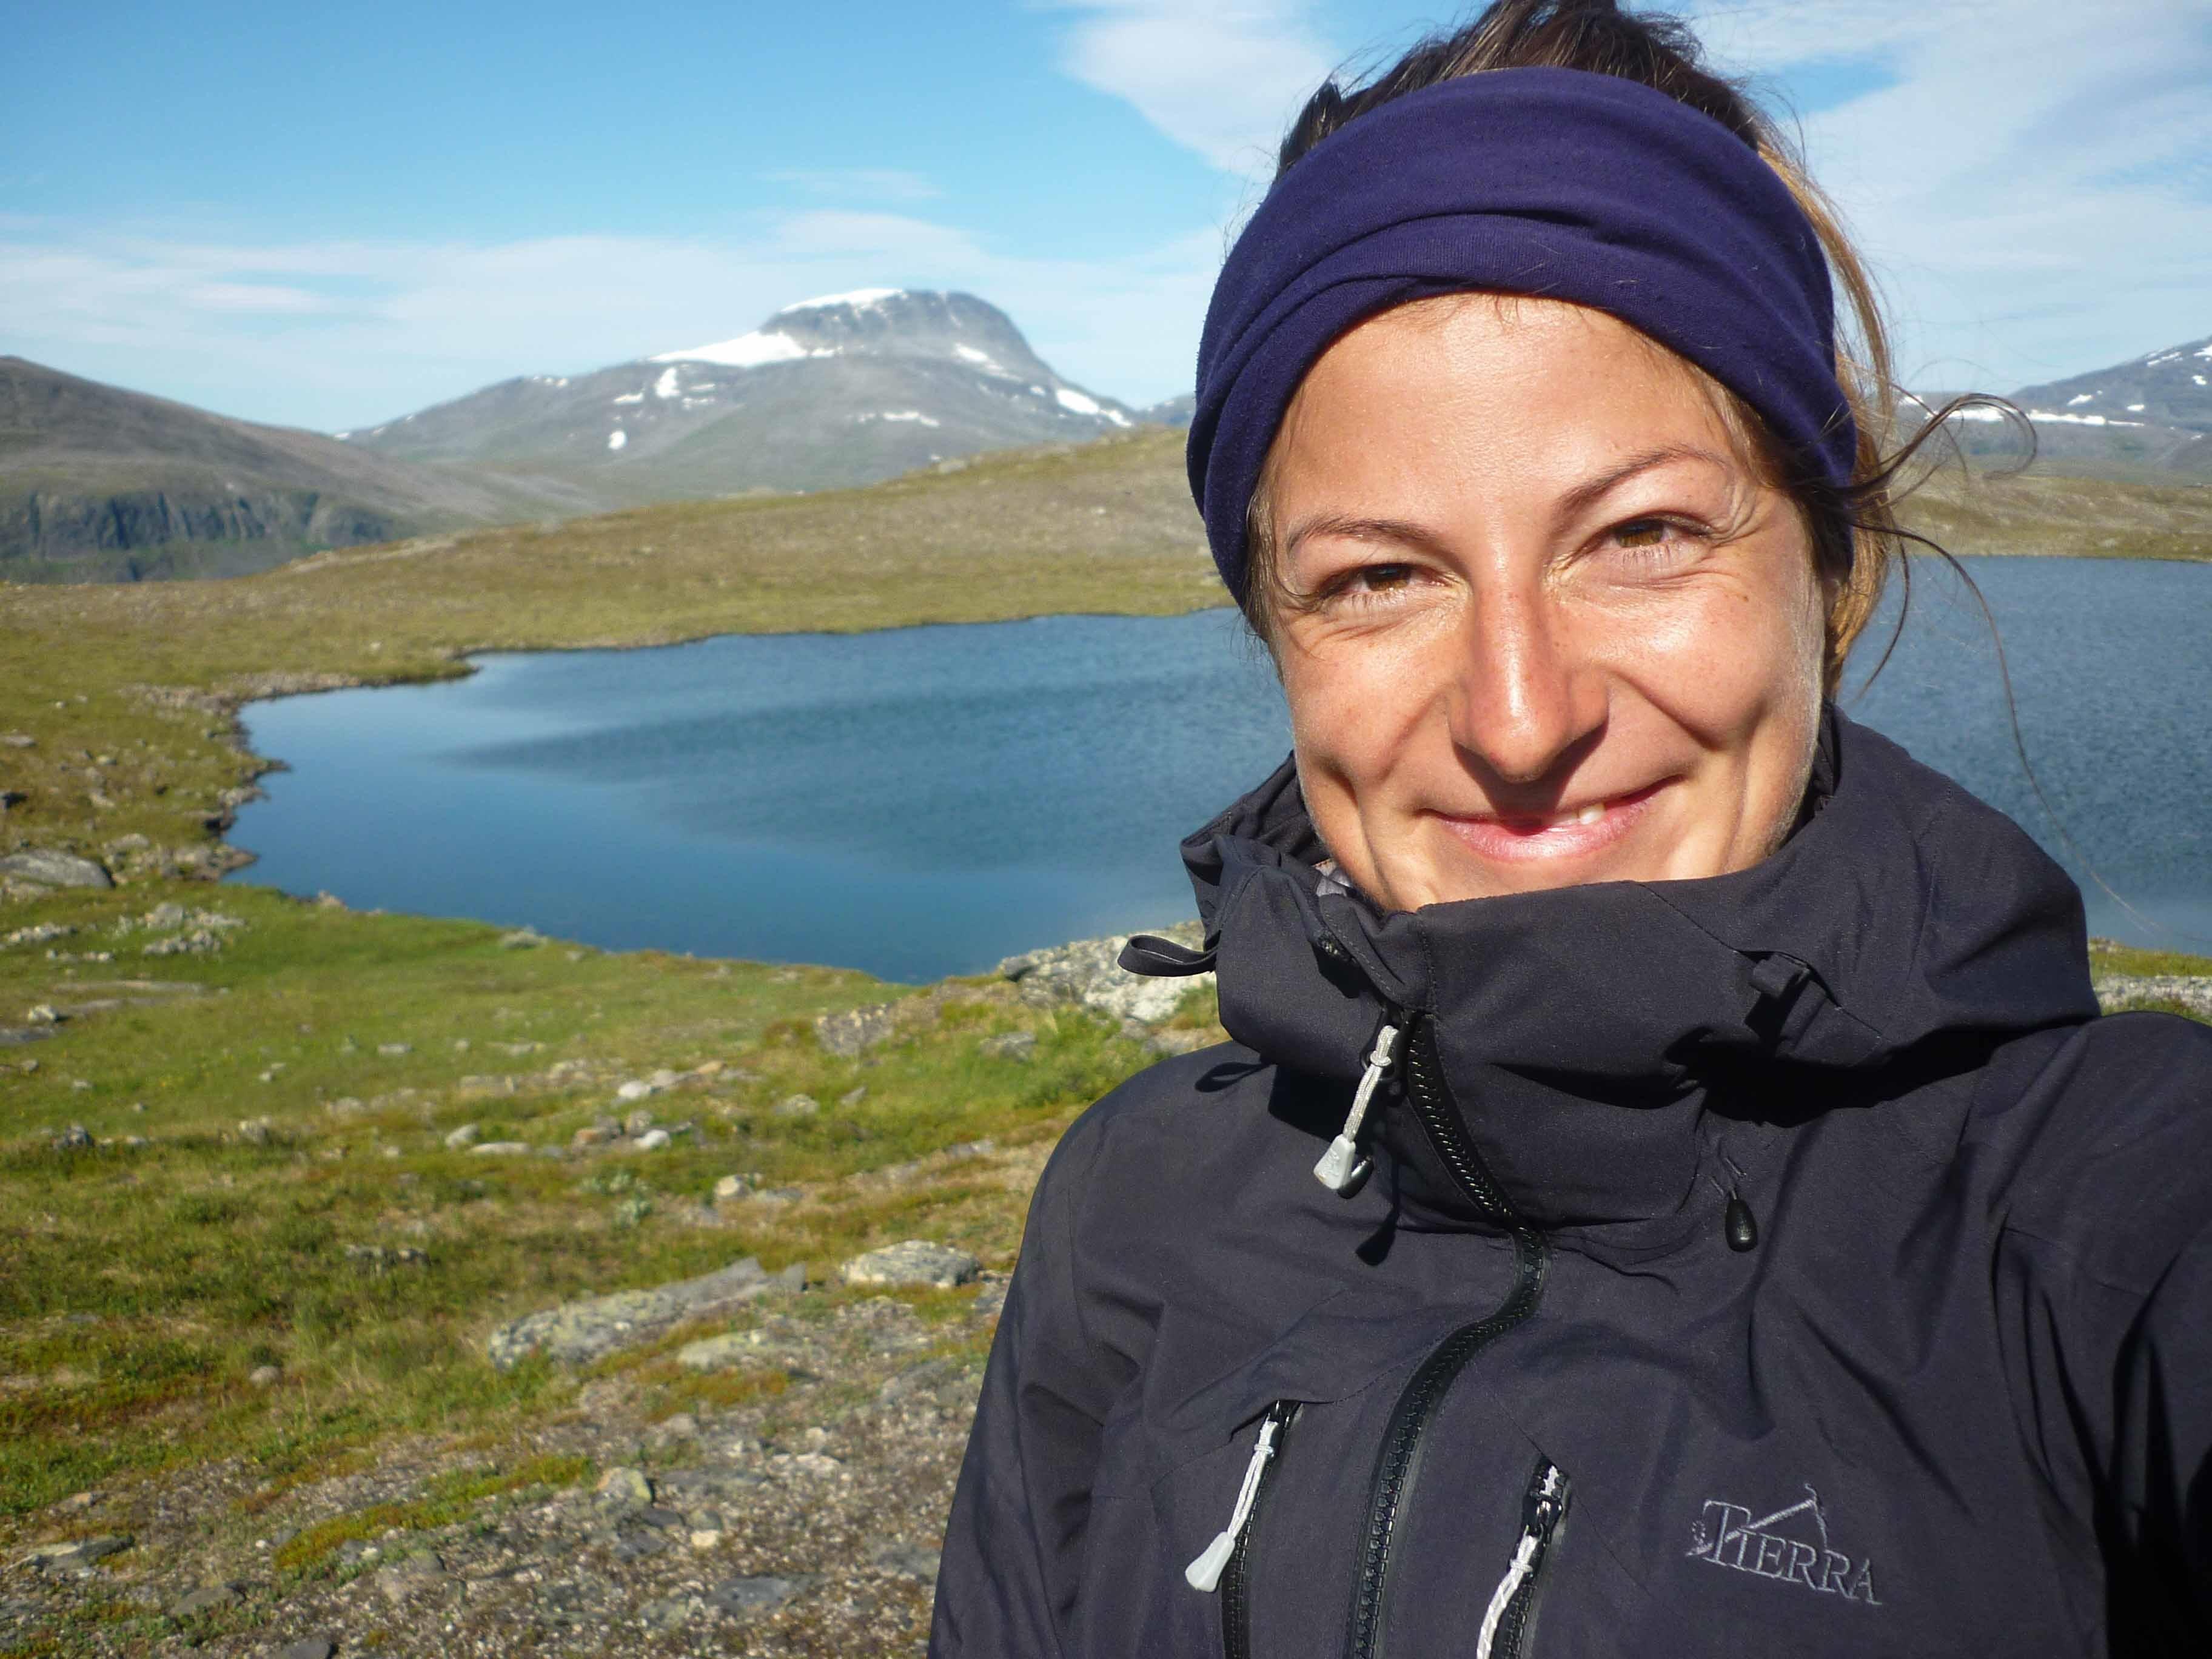 Julia Kukulies